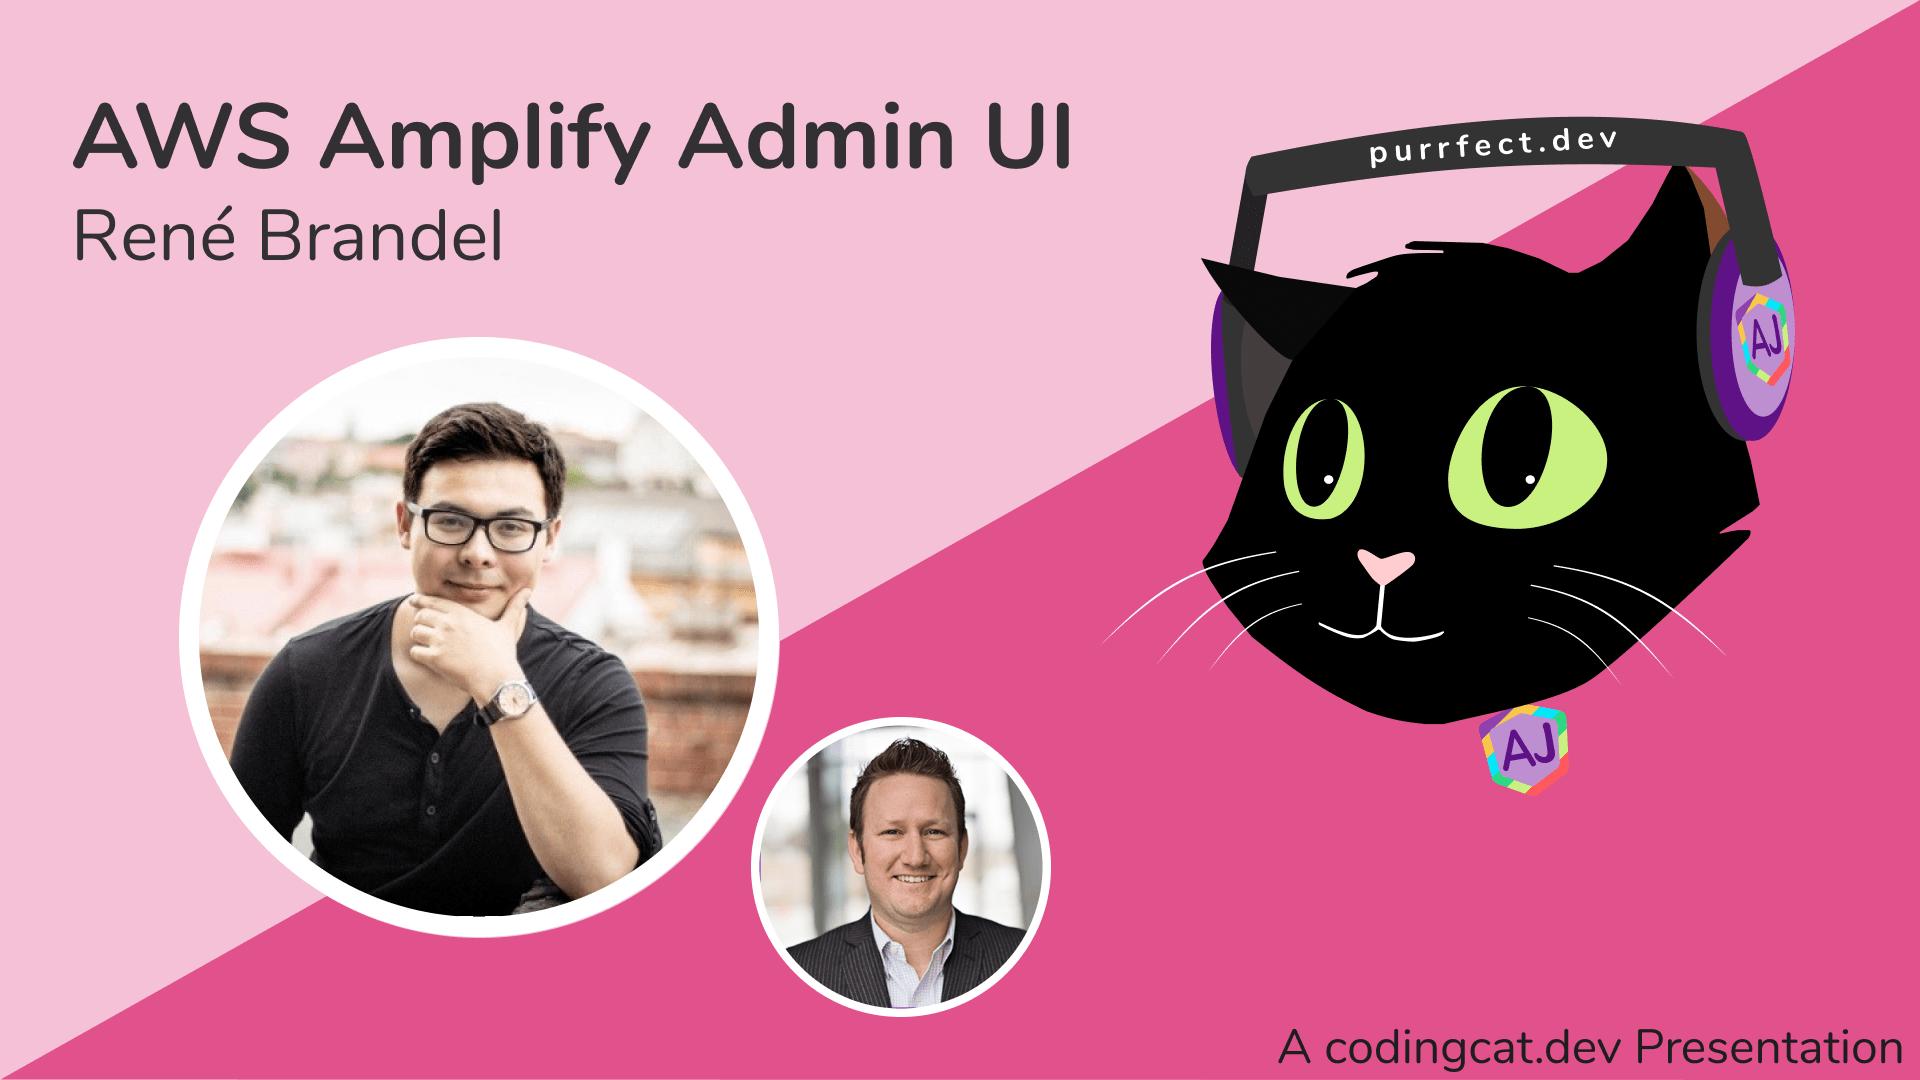 1.3 - AWS Amplify Admin with Rene Brandel